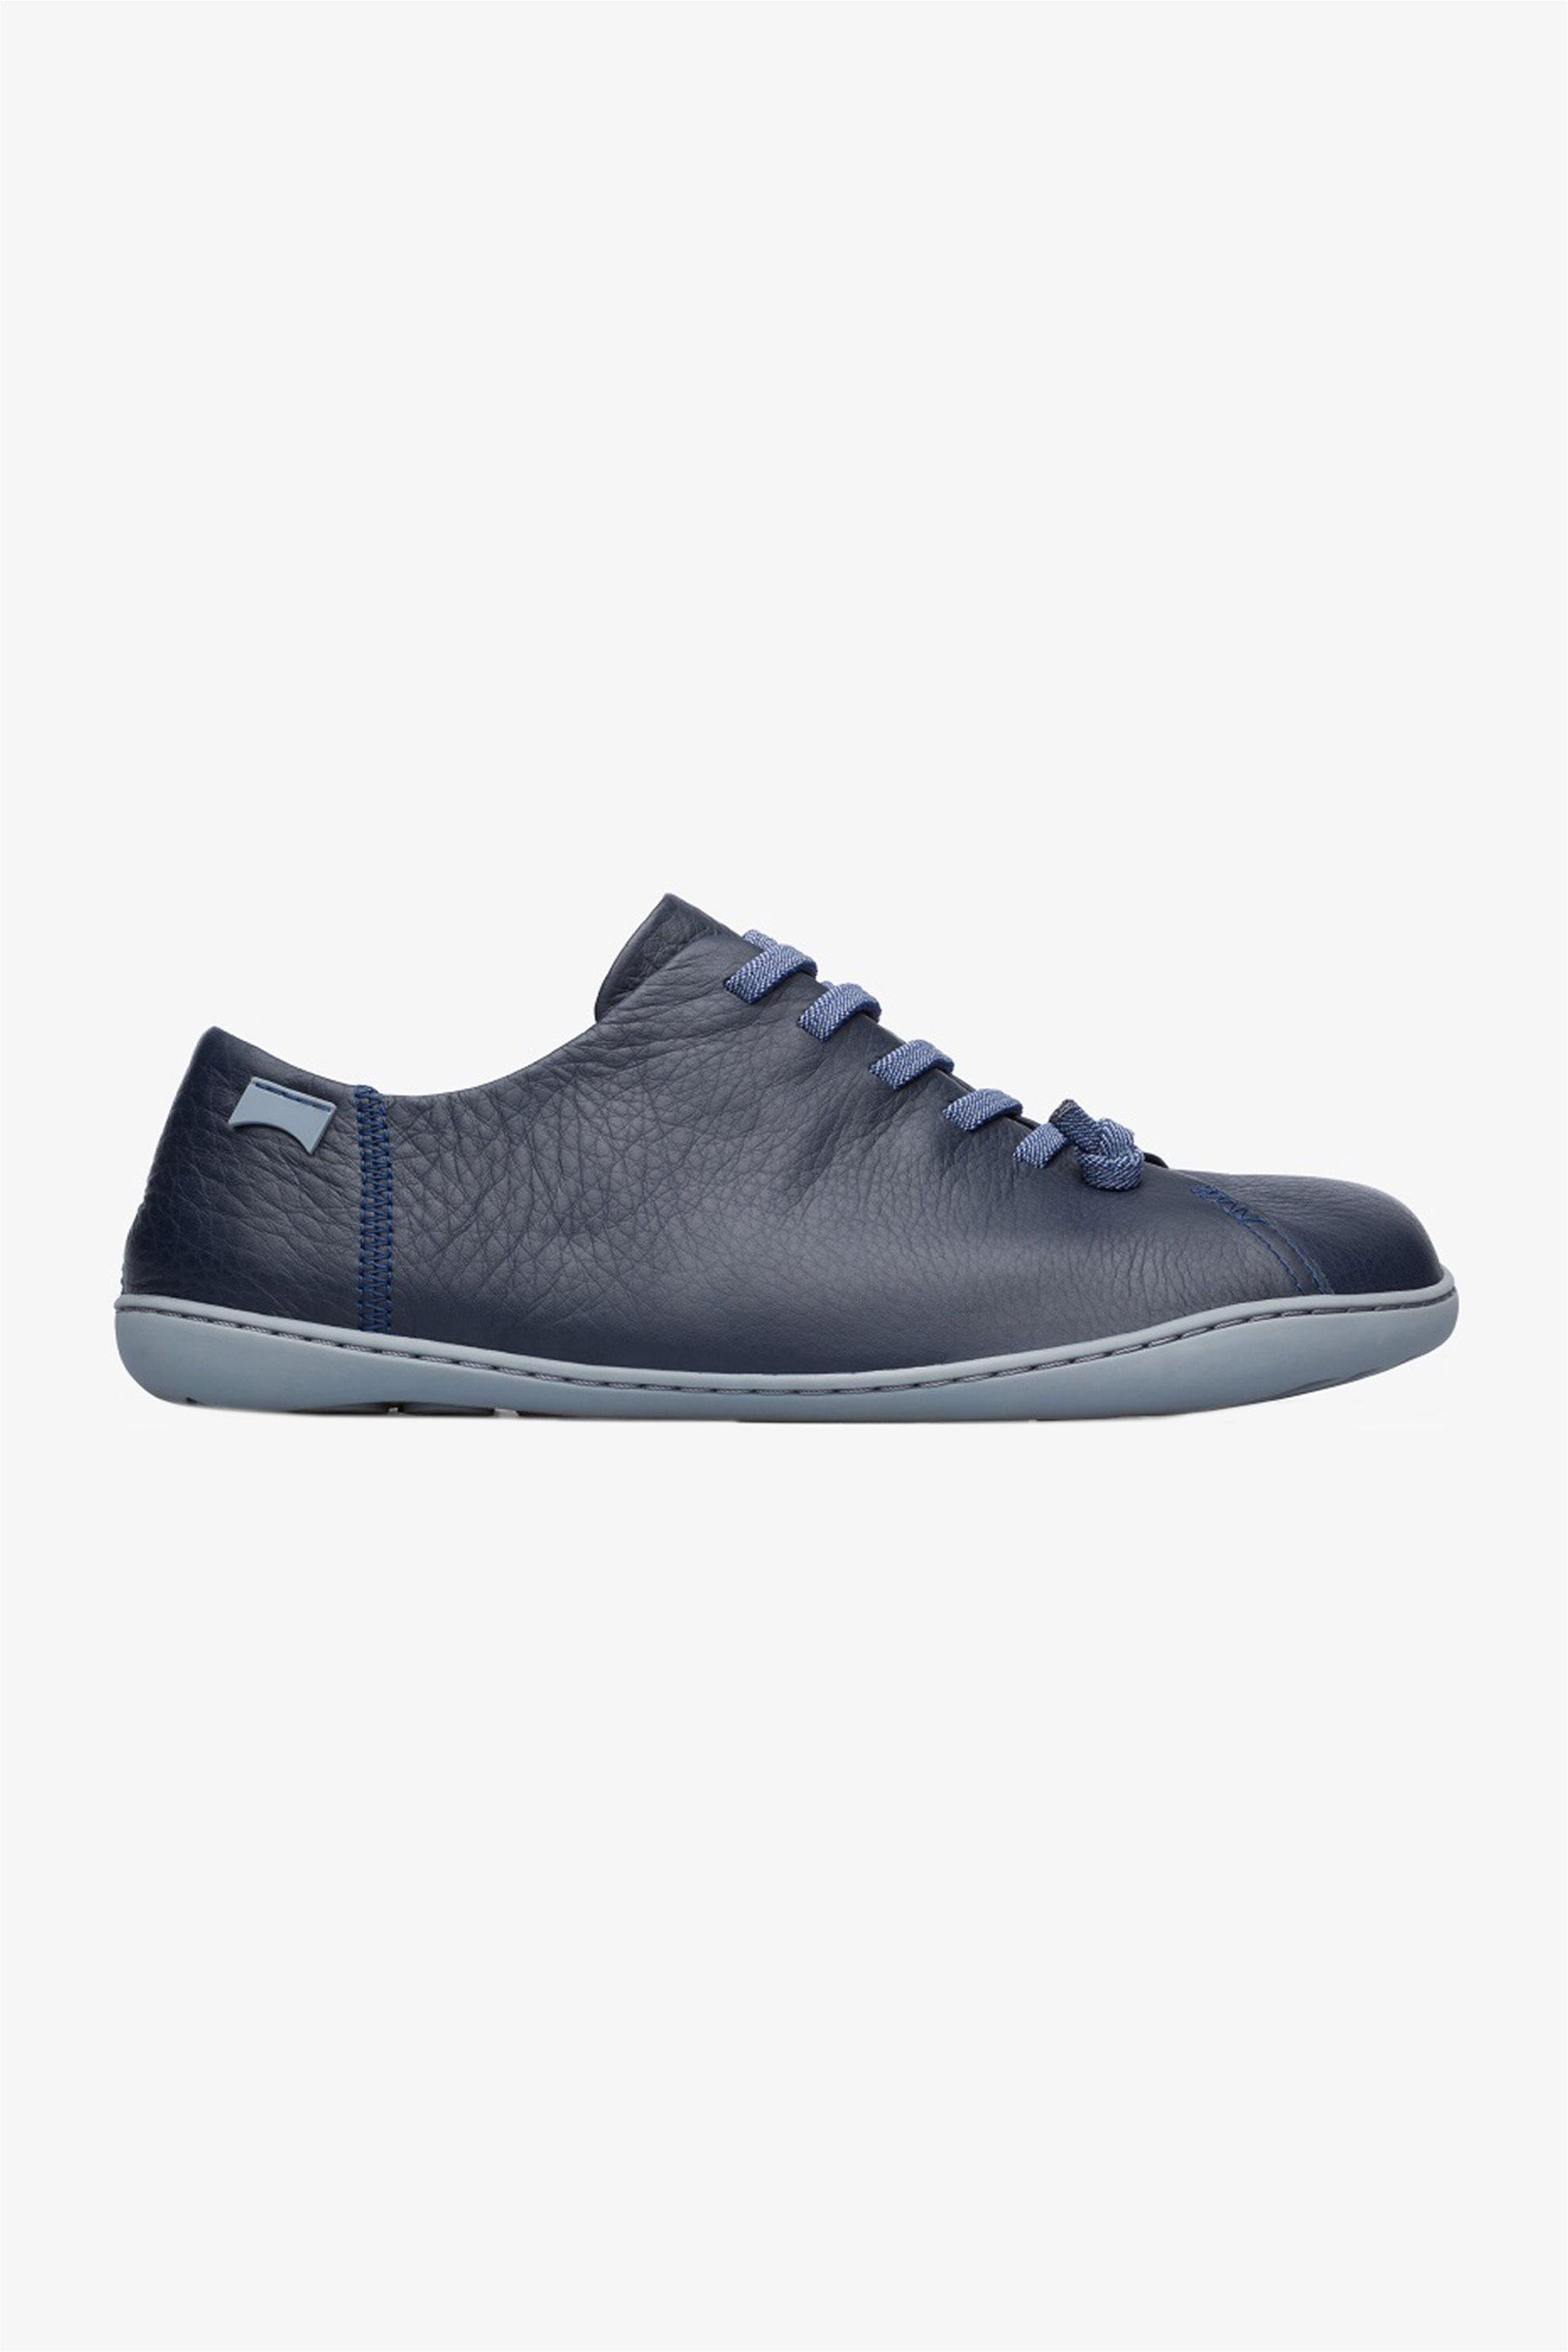 "Camper ανδρικά sneakers με ελαστικά κορδόνια ""Peu"" – K100249-013 – Μπλε Σκούρο"